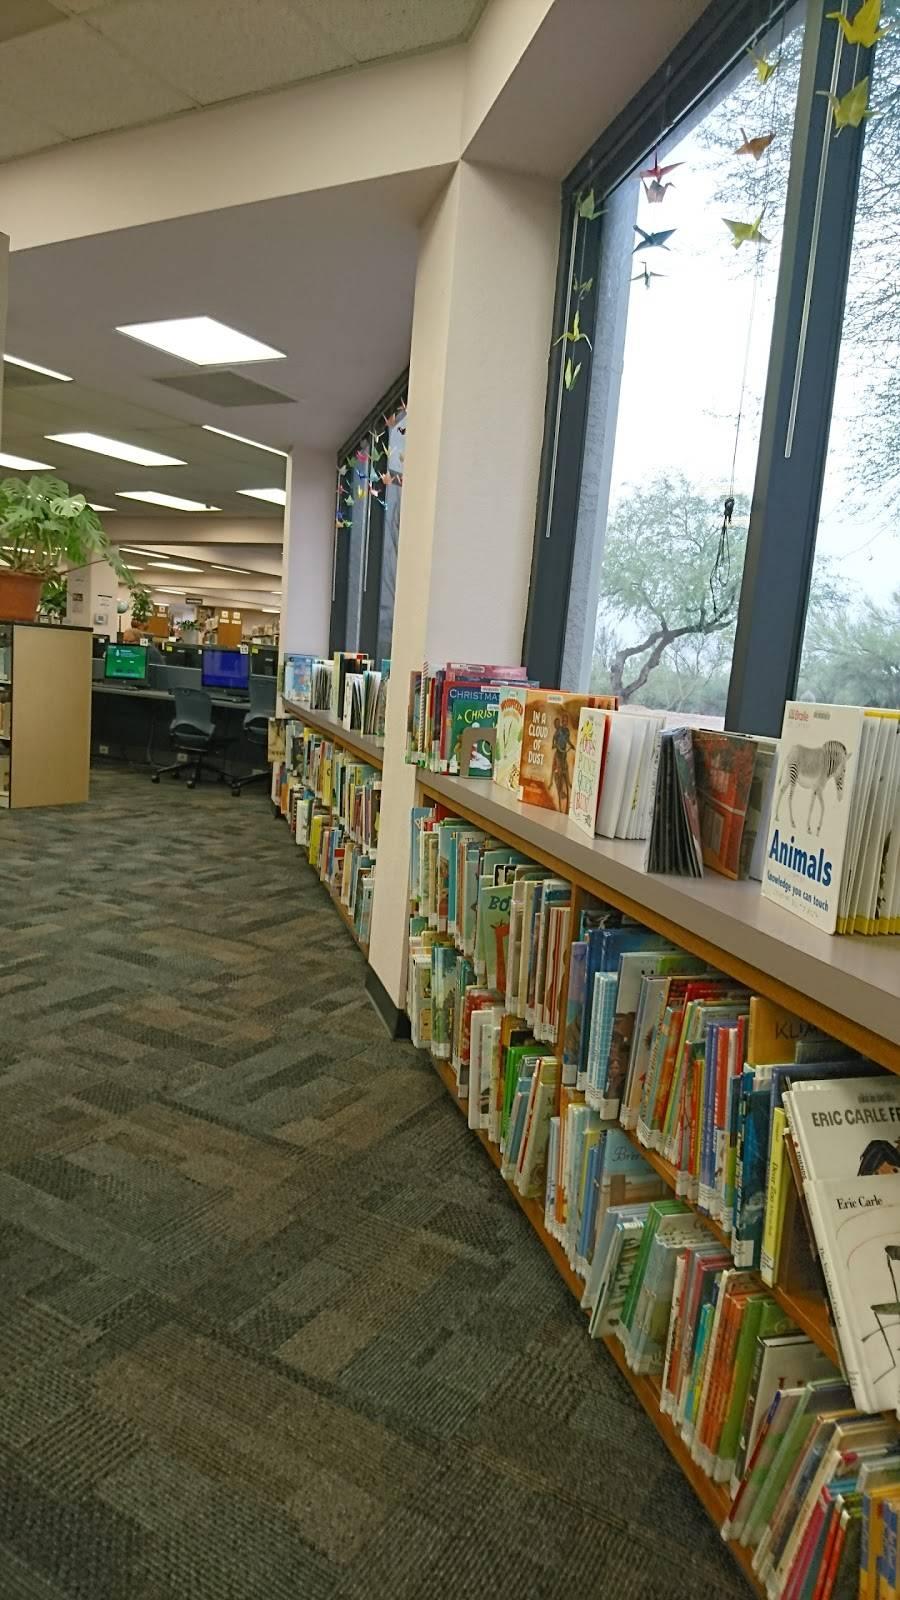 Nanini Library - library    Photo 7 of 9   Address: 7300 N Shannon Rd, Tucson, AZ 85741, USA   Phone: (520) 594-5365